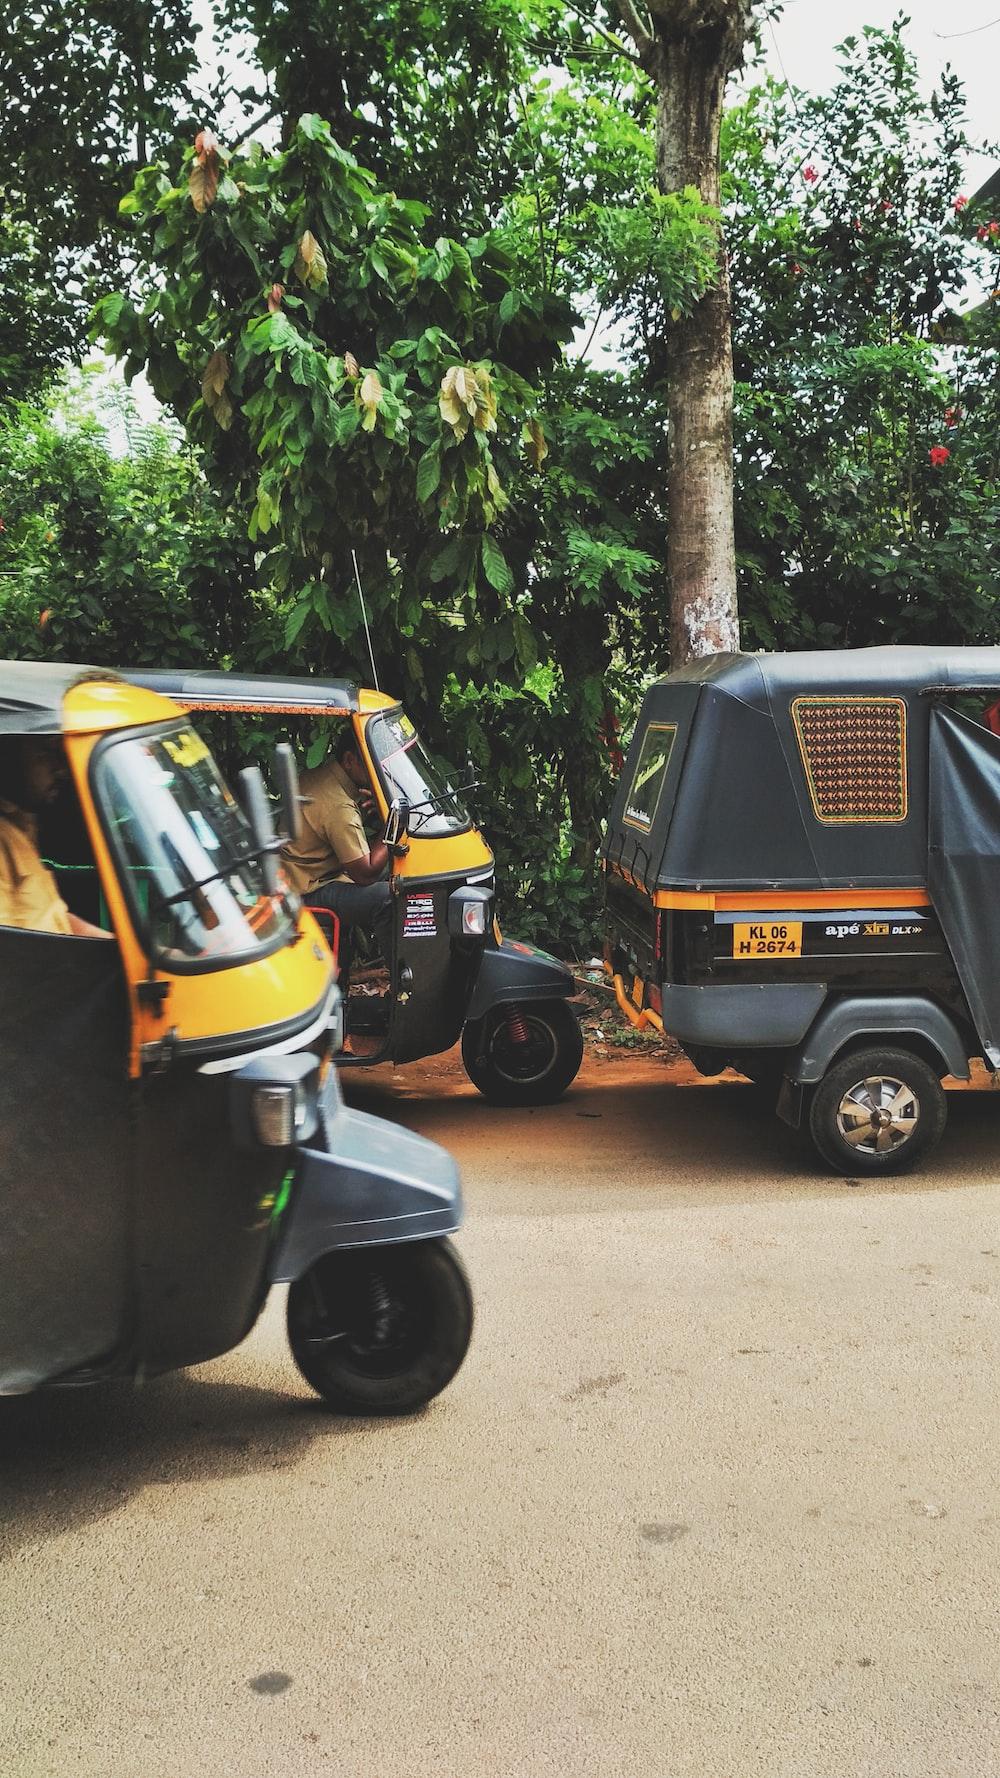 auto-rickshaw passing through tree